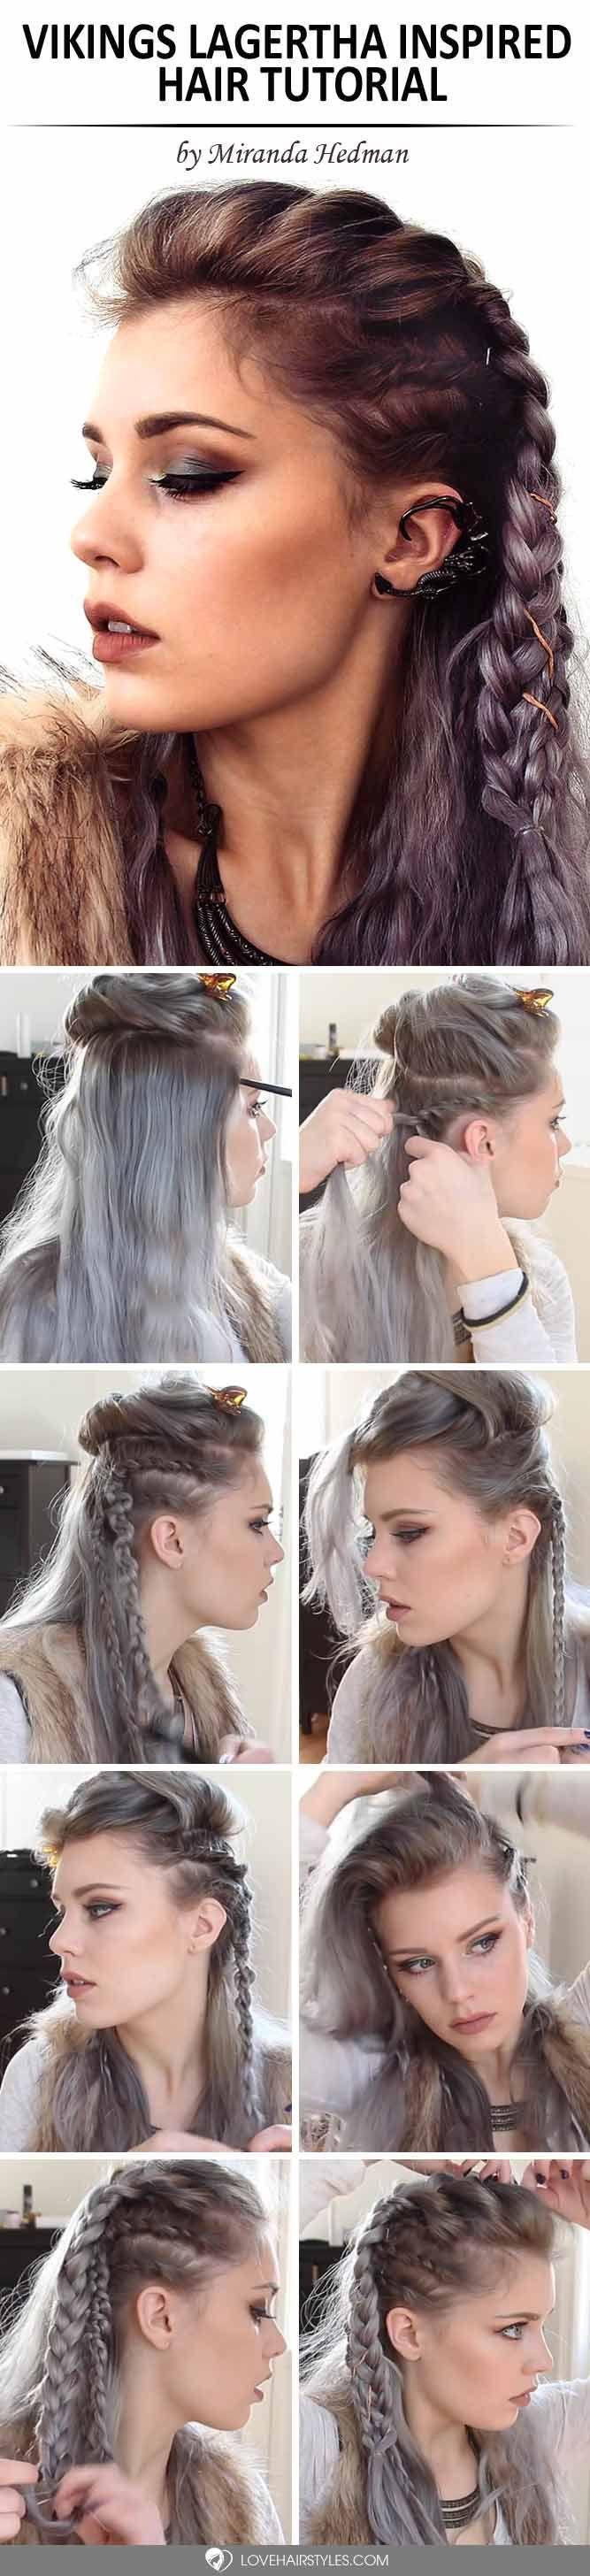 Vikings Lagertha Inspired Hair Tutorial ★ See more: lovehairstyles.co...